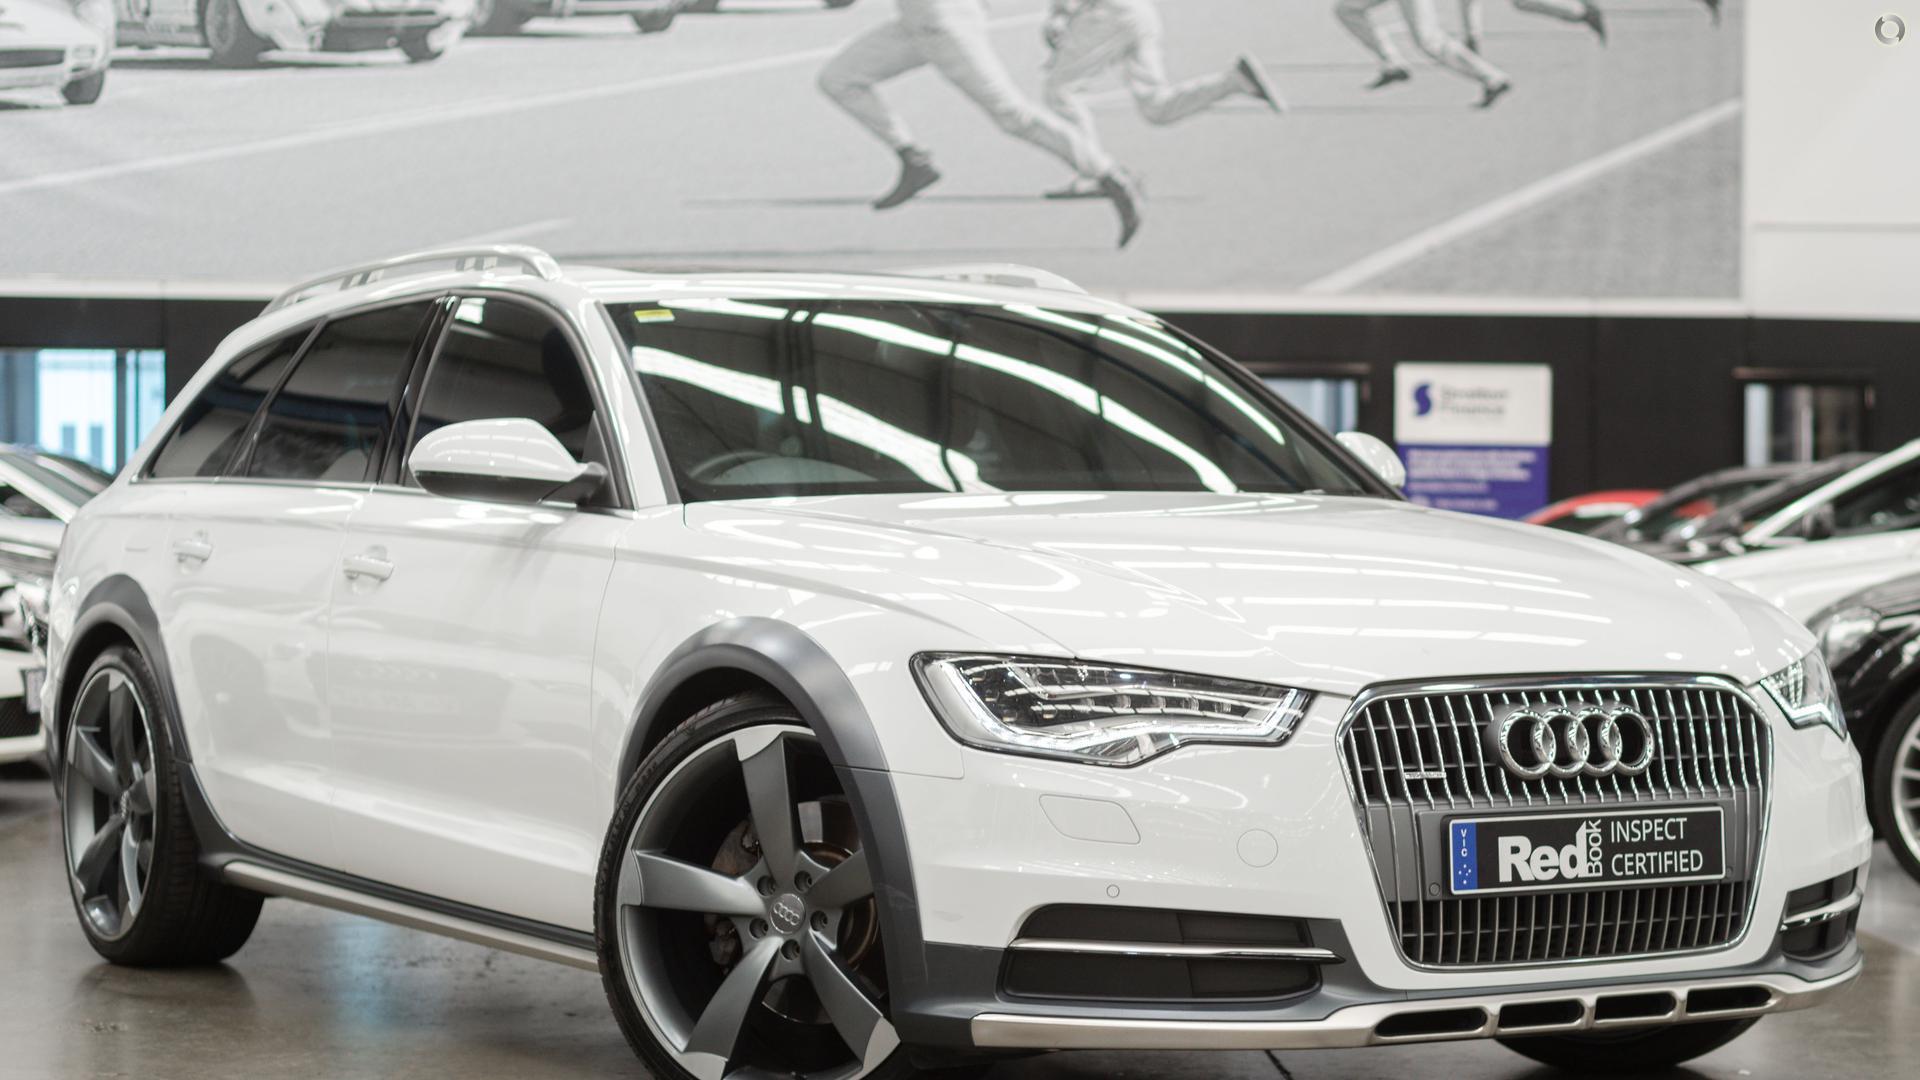 2013 Audi A6 C7